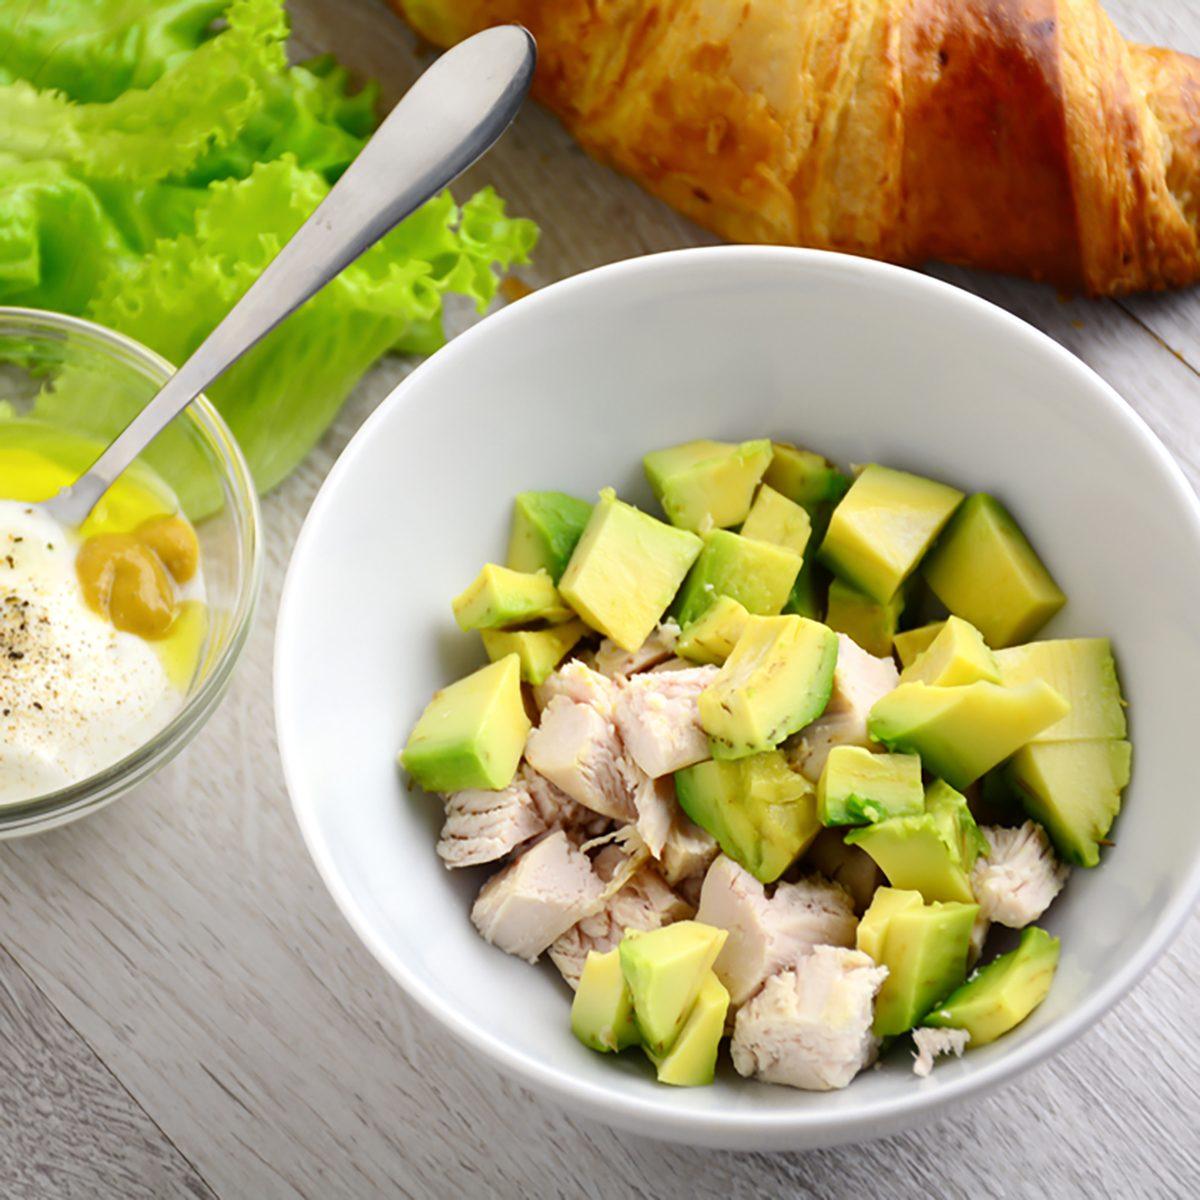 Preparing chicken avocado salad with light yogurt dressing on gray wooden table.